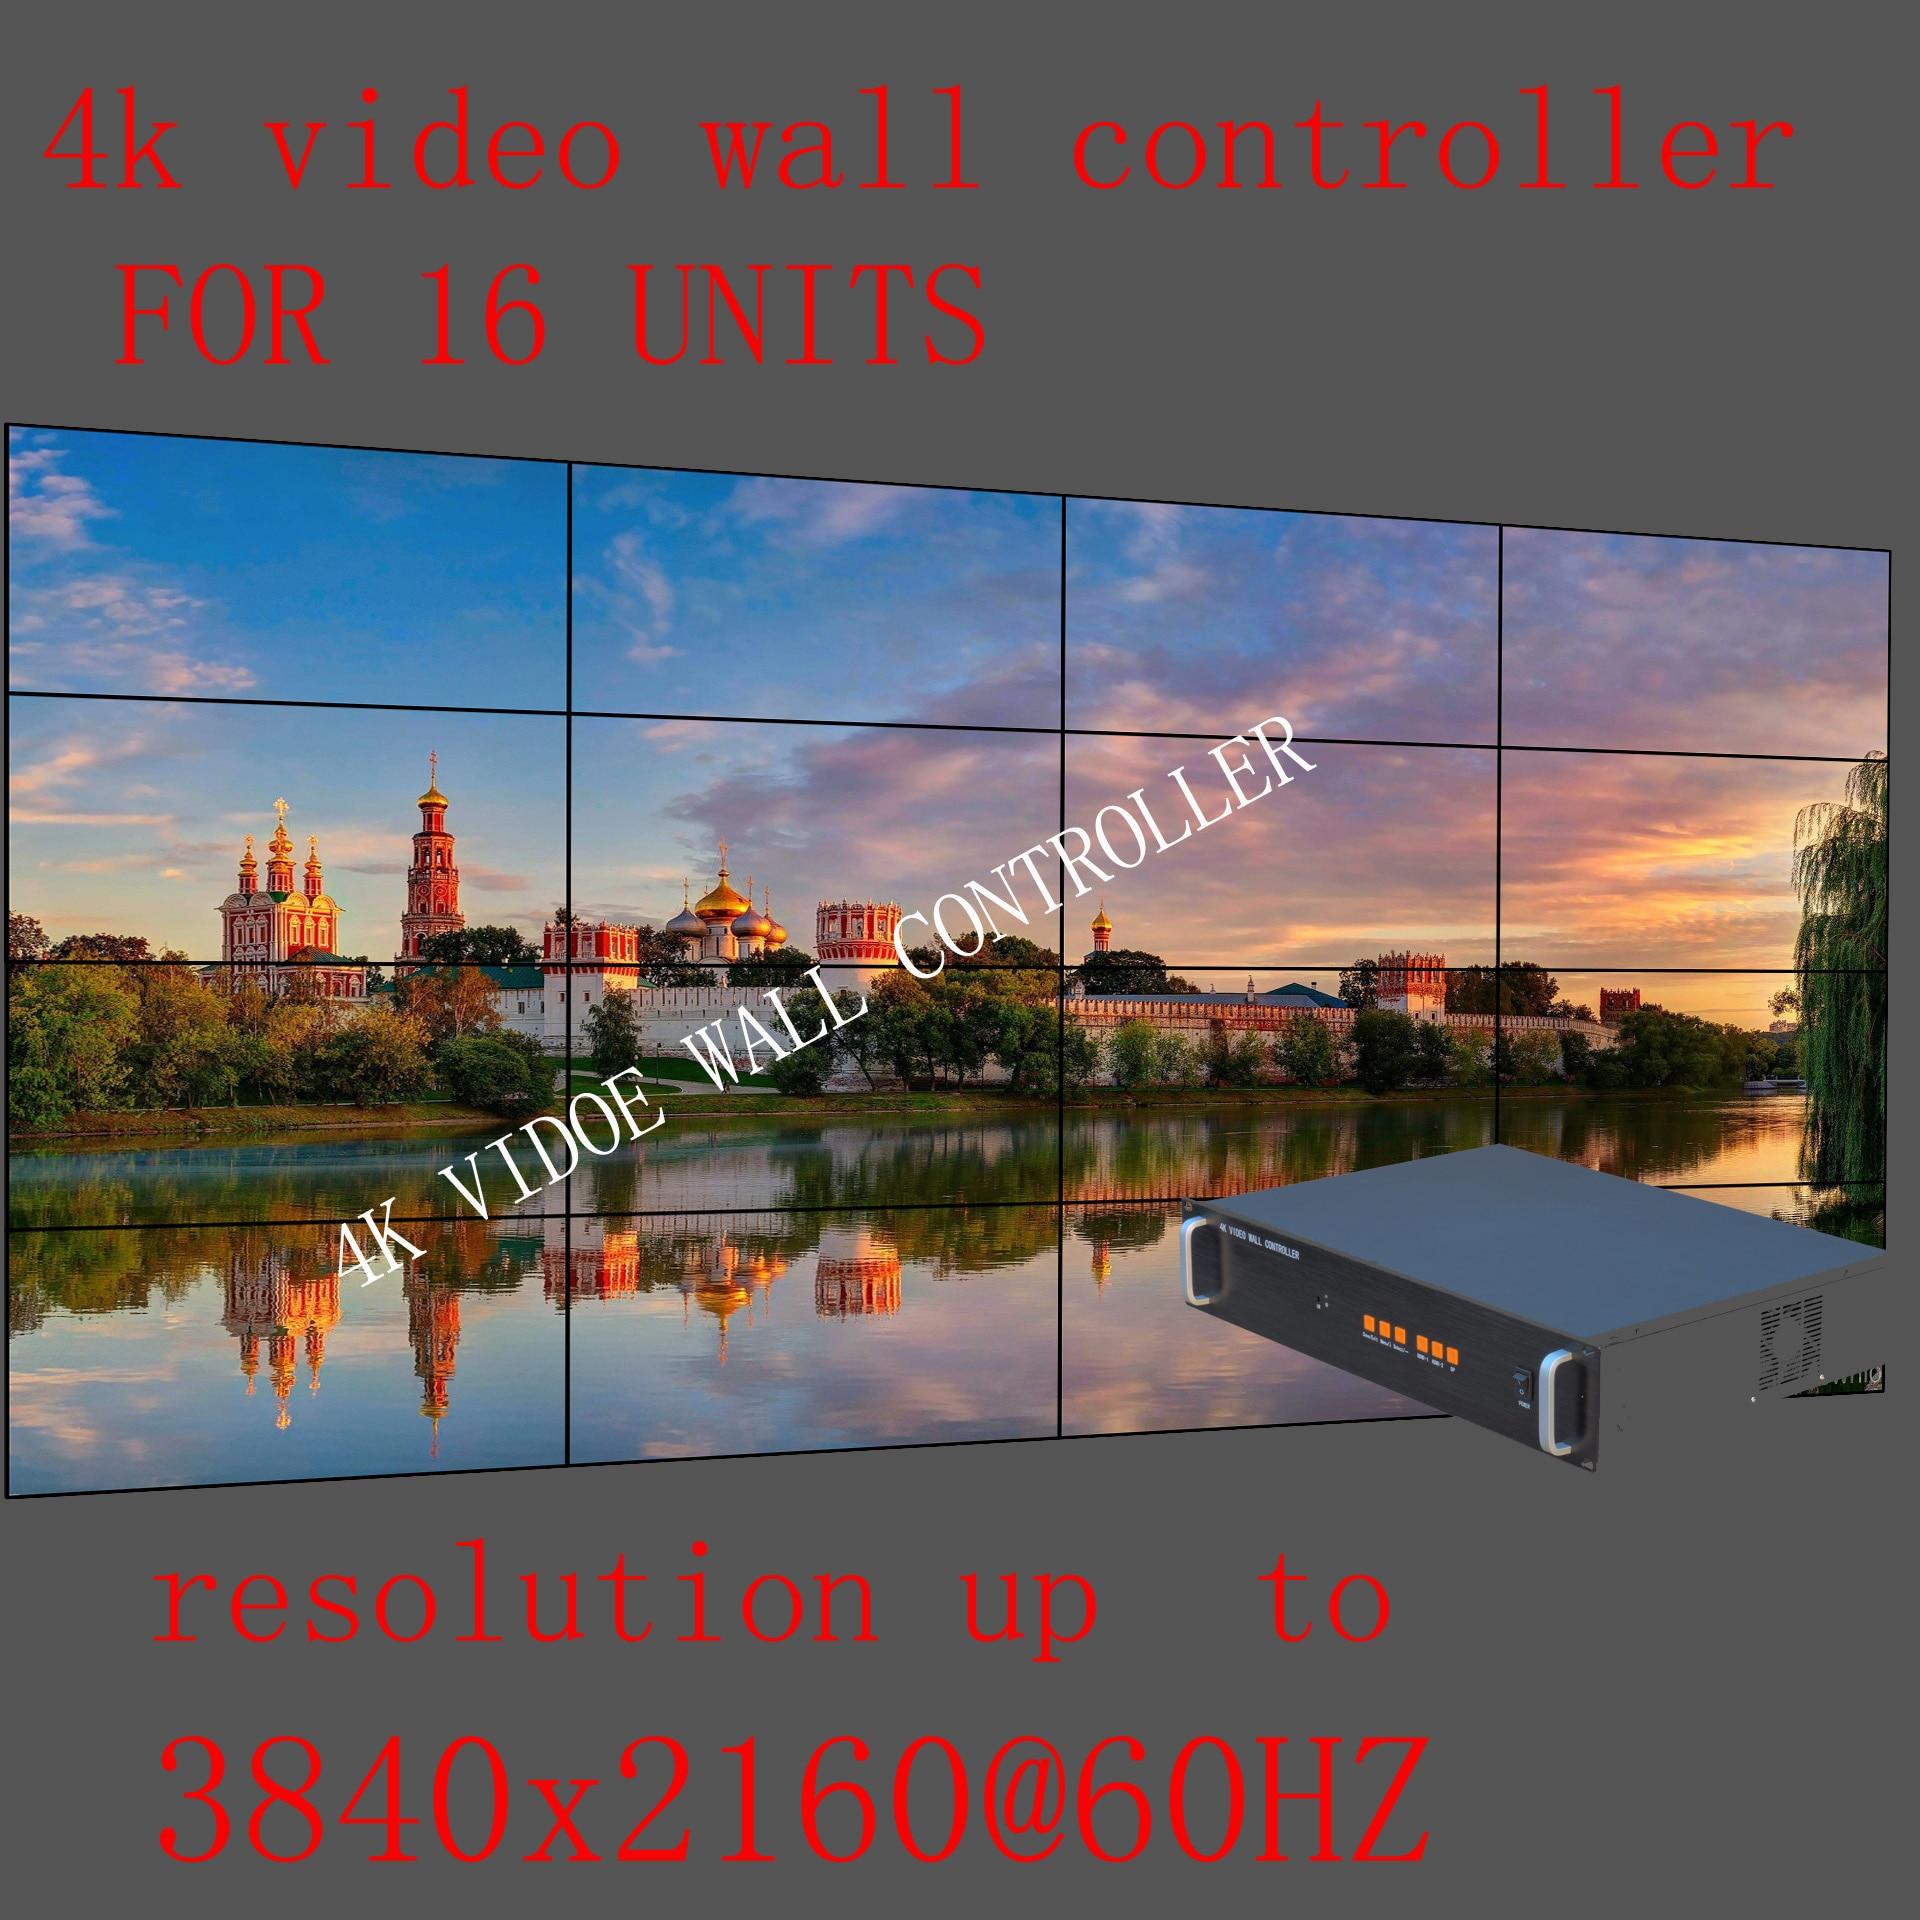 Controlador de pared de vídeo 4x4 4 K, controlador de pared de TV HDMI para 16 unidades, procesador de pared LCD 16, admite entrada de señal 4K @ 60HZ